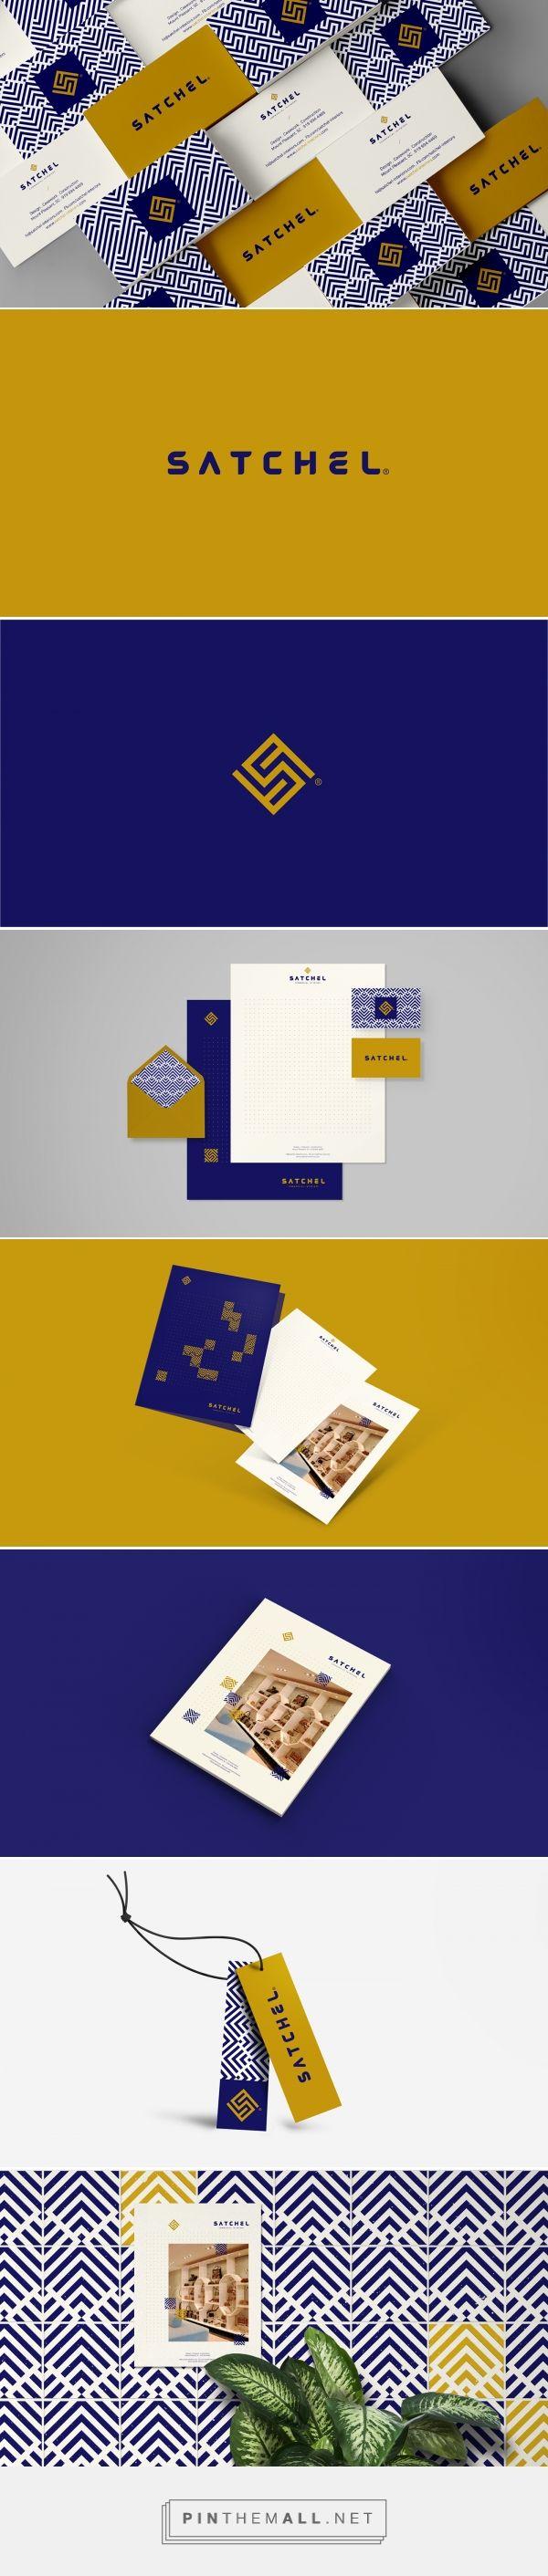 Satchel Interior Design Branding by Roberto Melendrez   Fivestar Branding Agency – Design and Branding Agency & Curated Inspiration Gallery